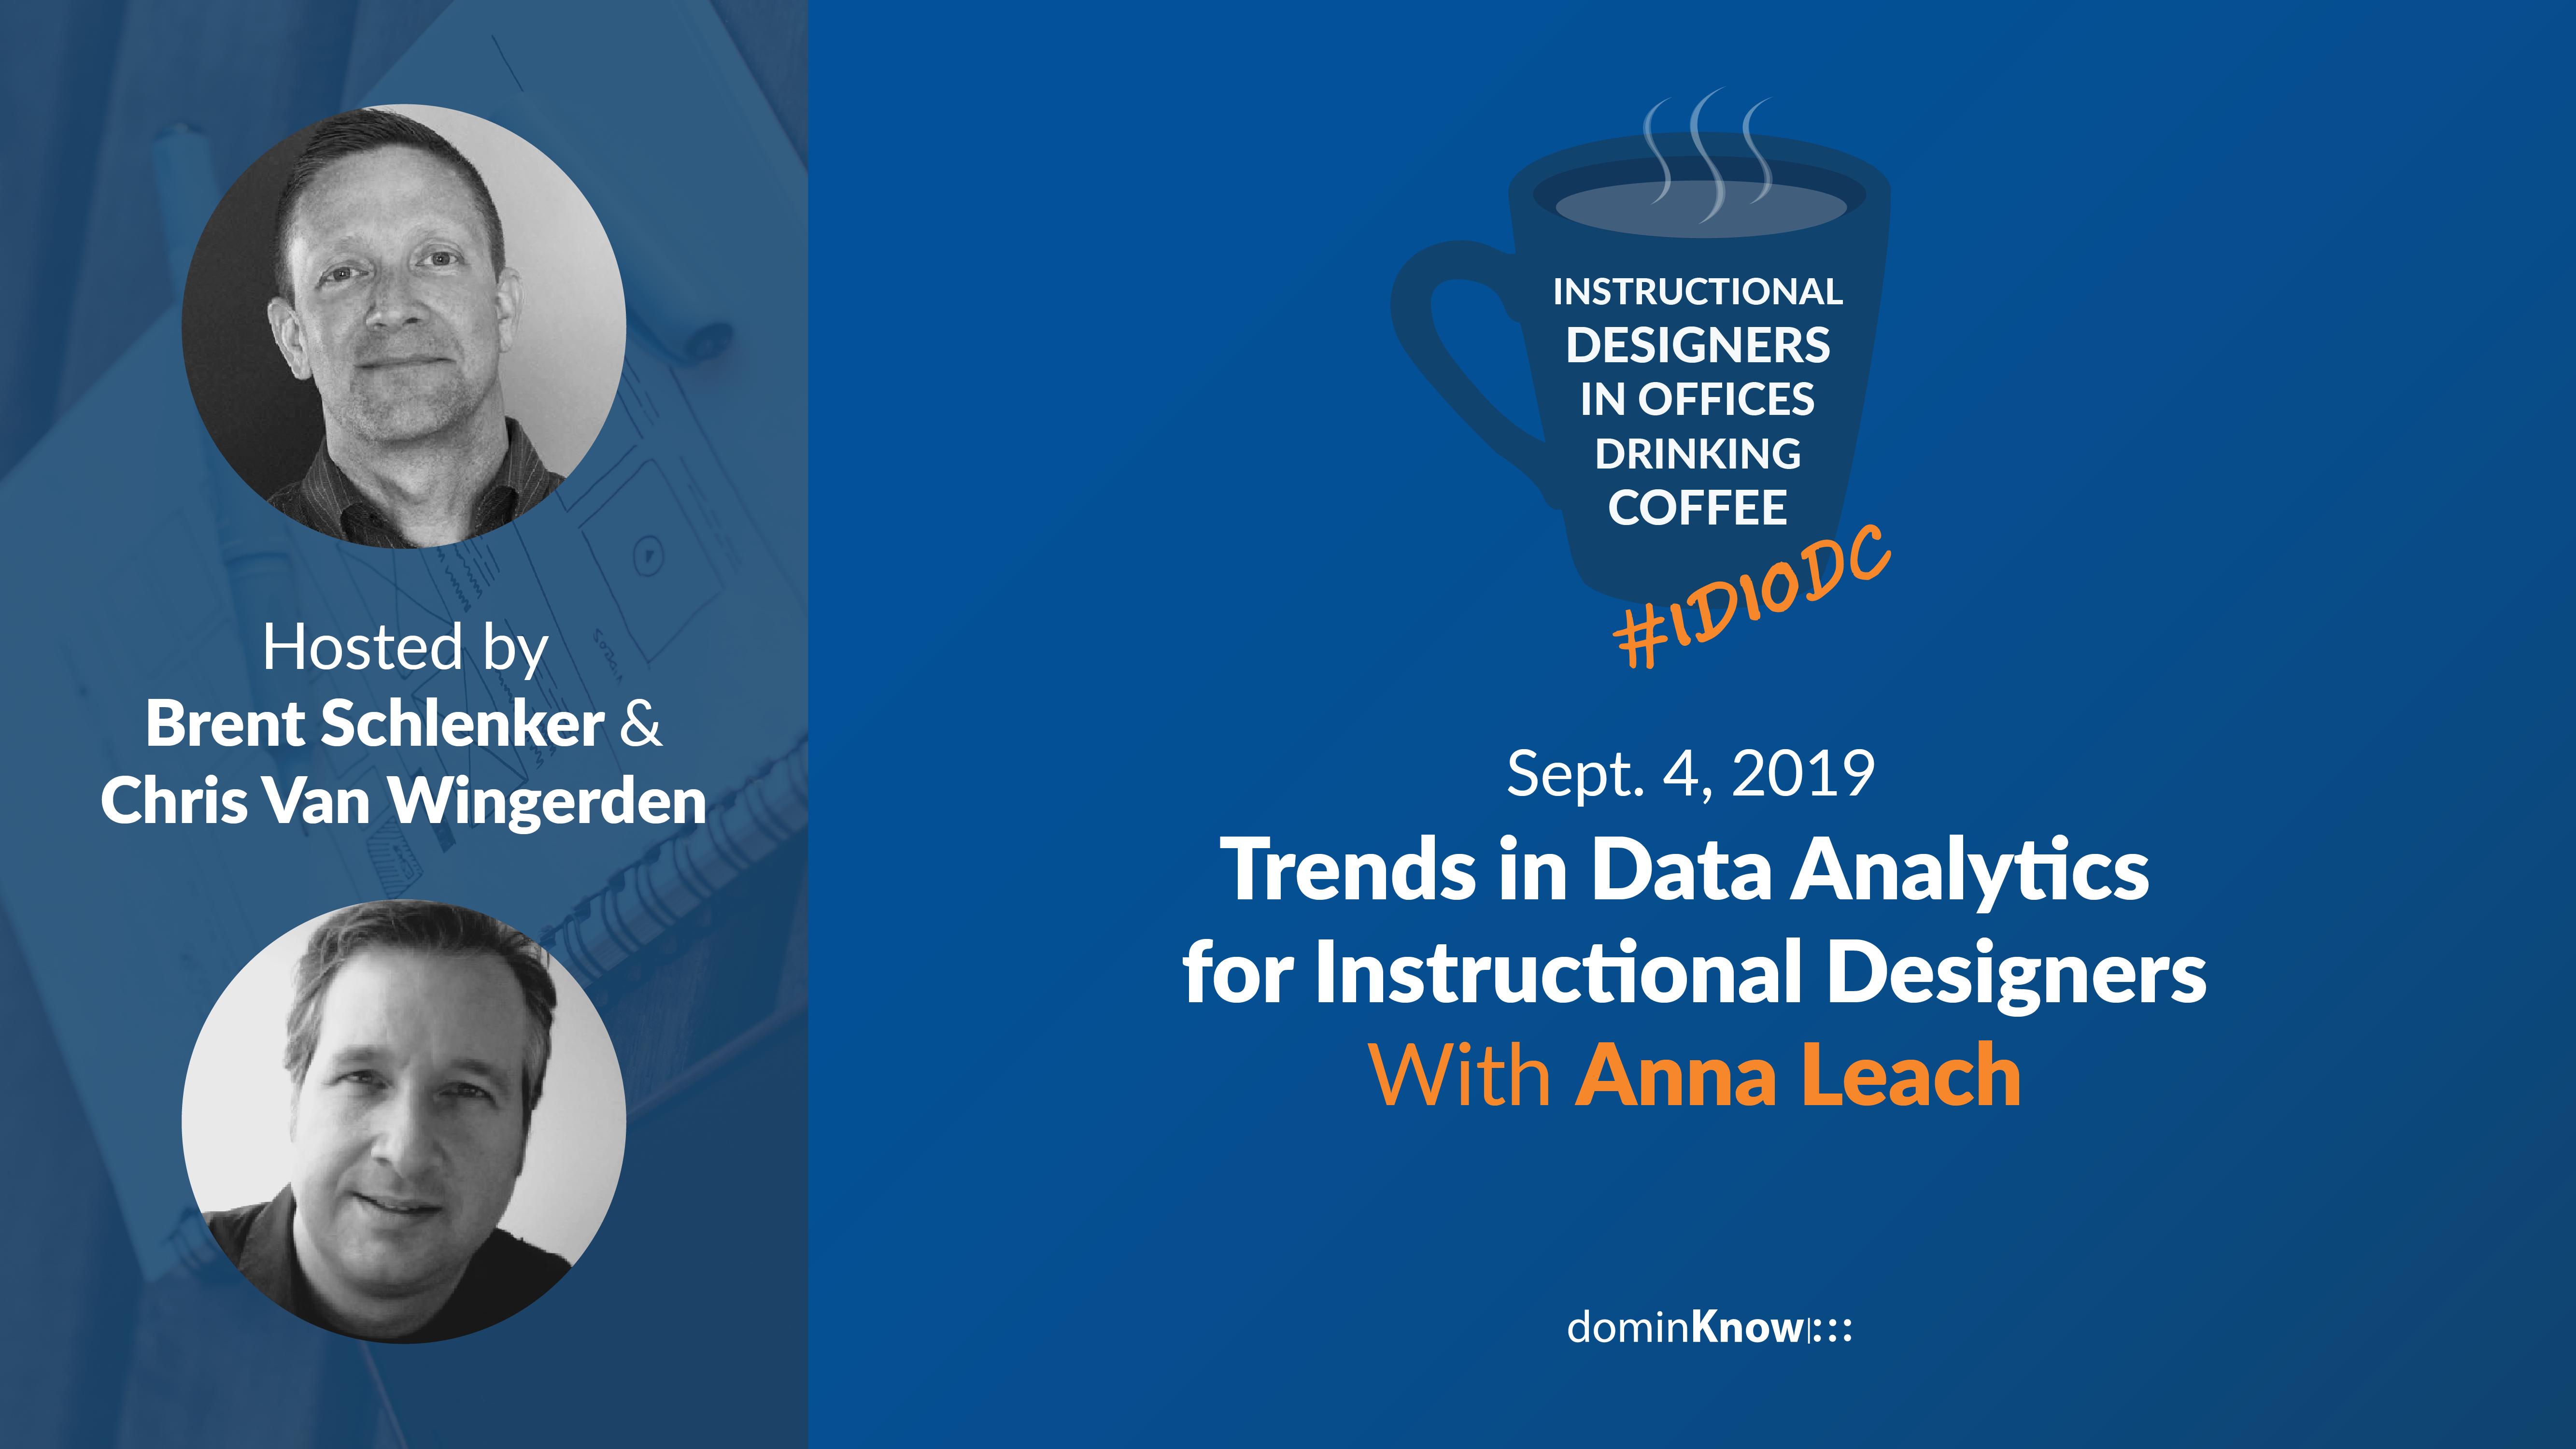 Trends in data analytics